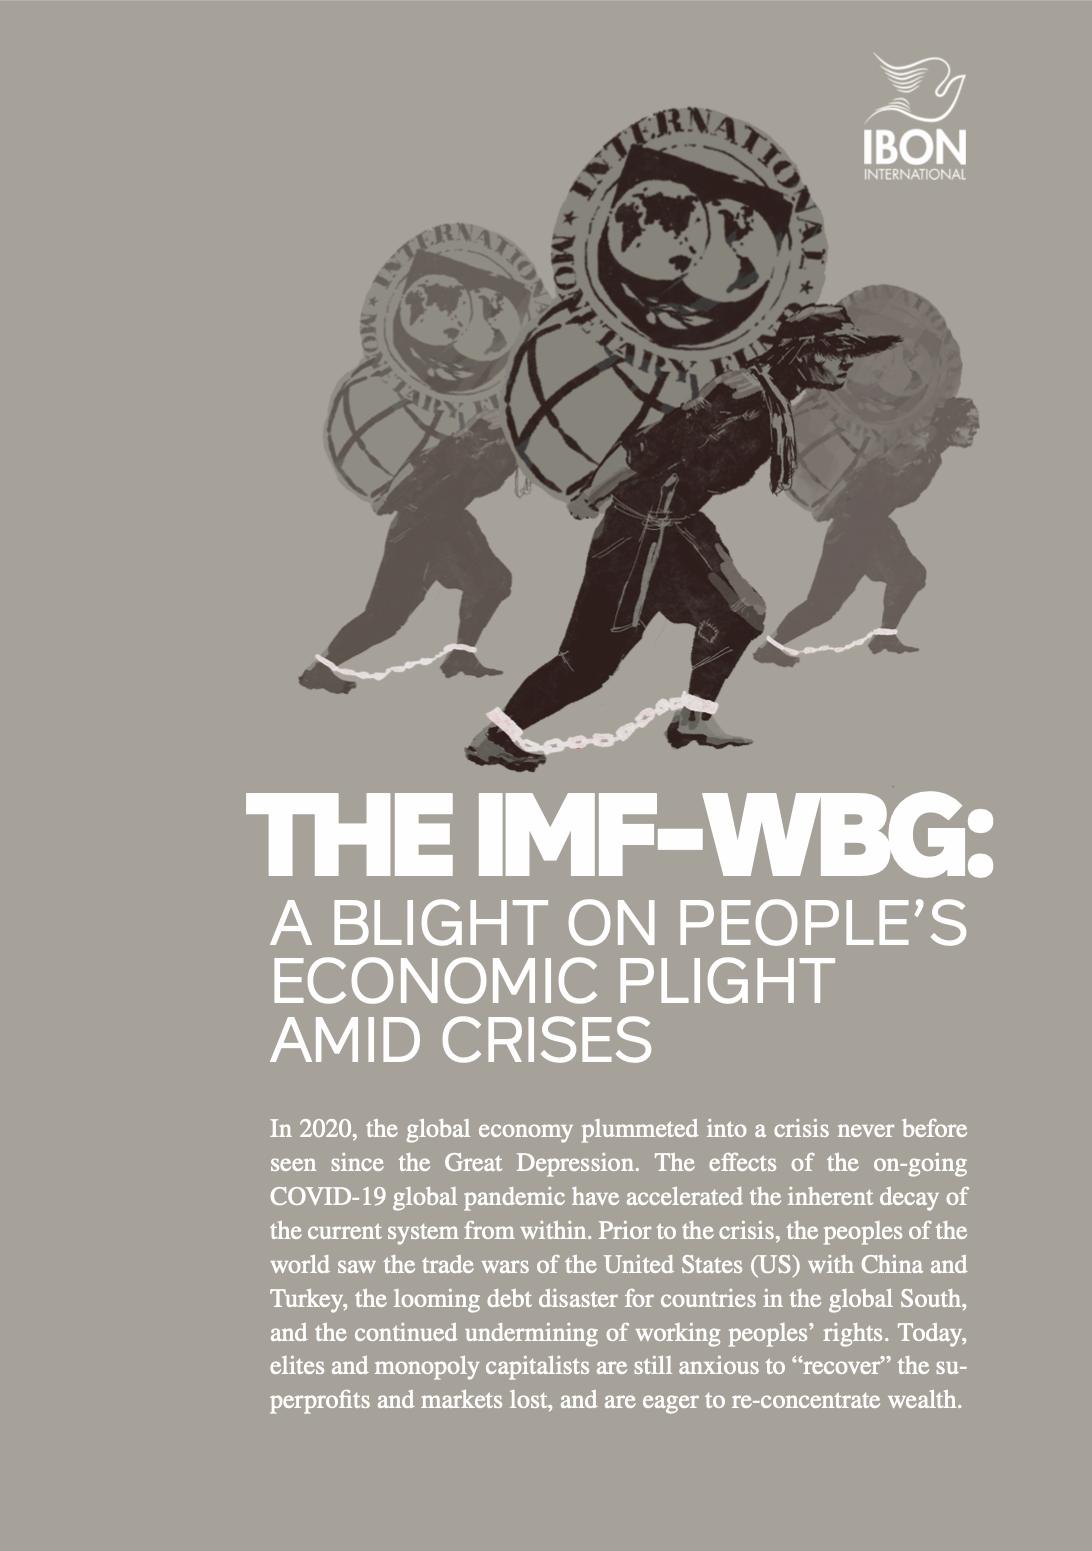 The IMF-WBG: A blight on people's economic plight amid crises